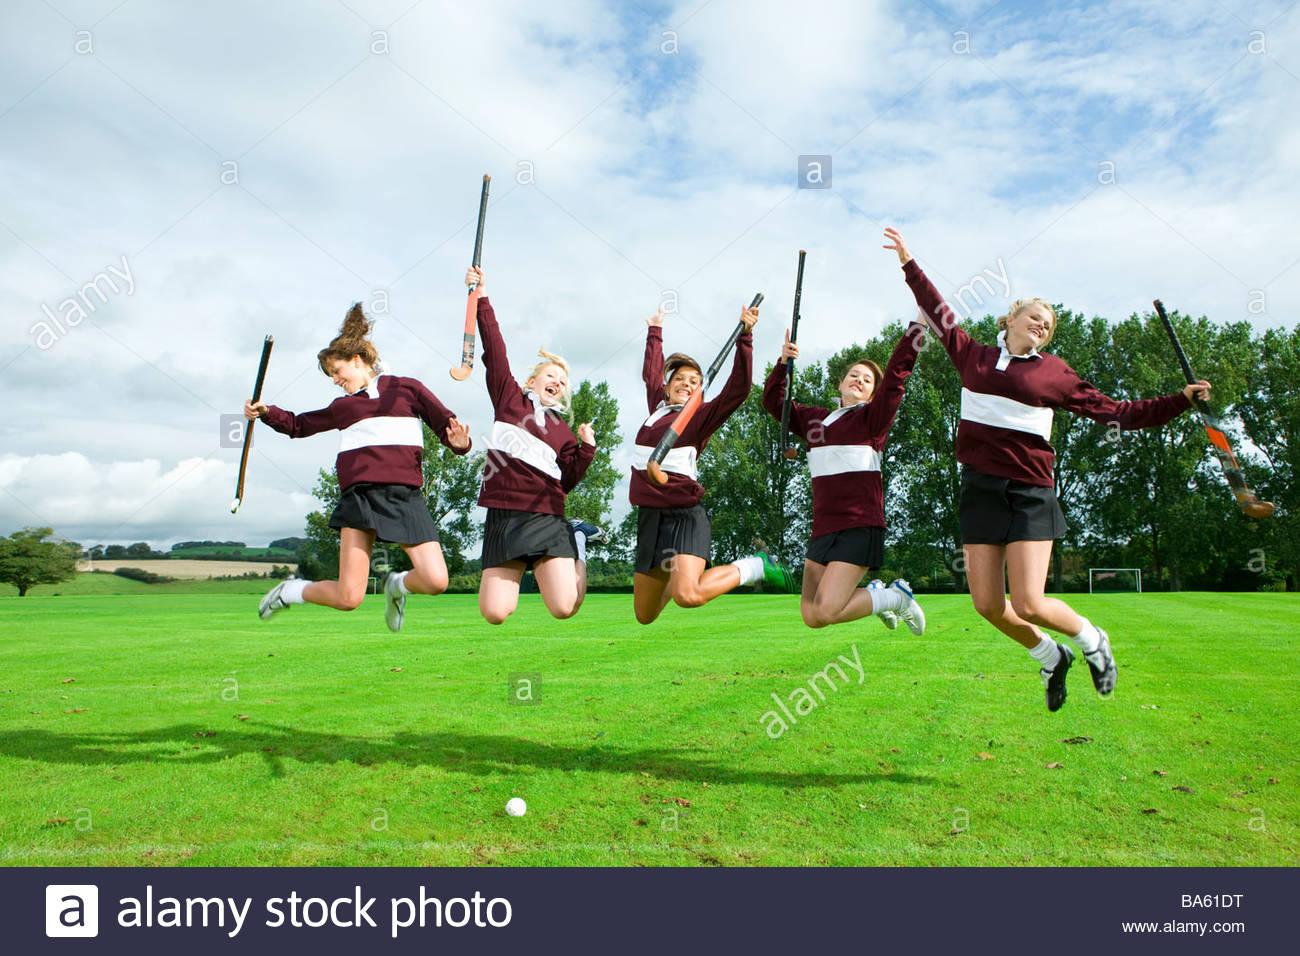 Teenage girl hockey team jumping on field - Stock Image